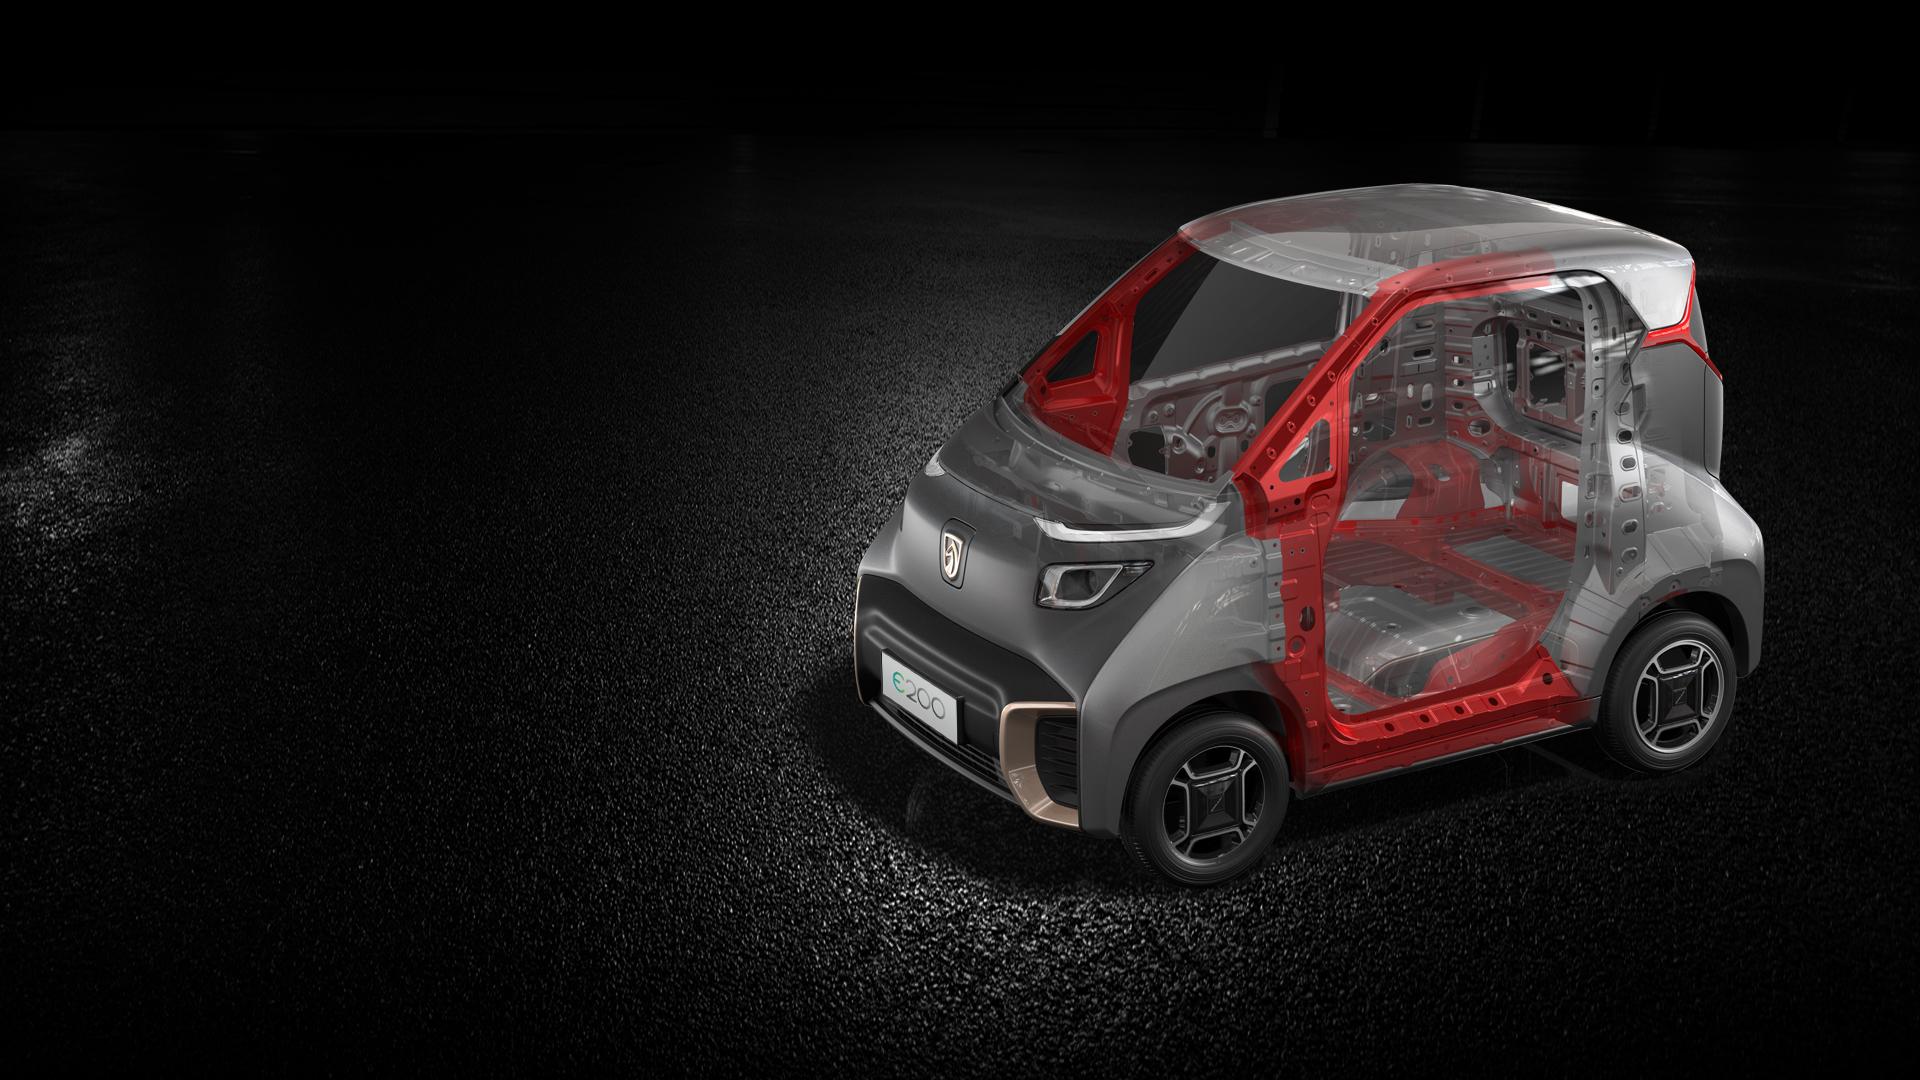 寶駿E200,電(dian)動汽(qi)車,新(xin)能源(yuan)車,車身,充電(dian),品質,安全(quan)